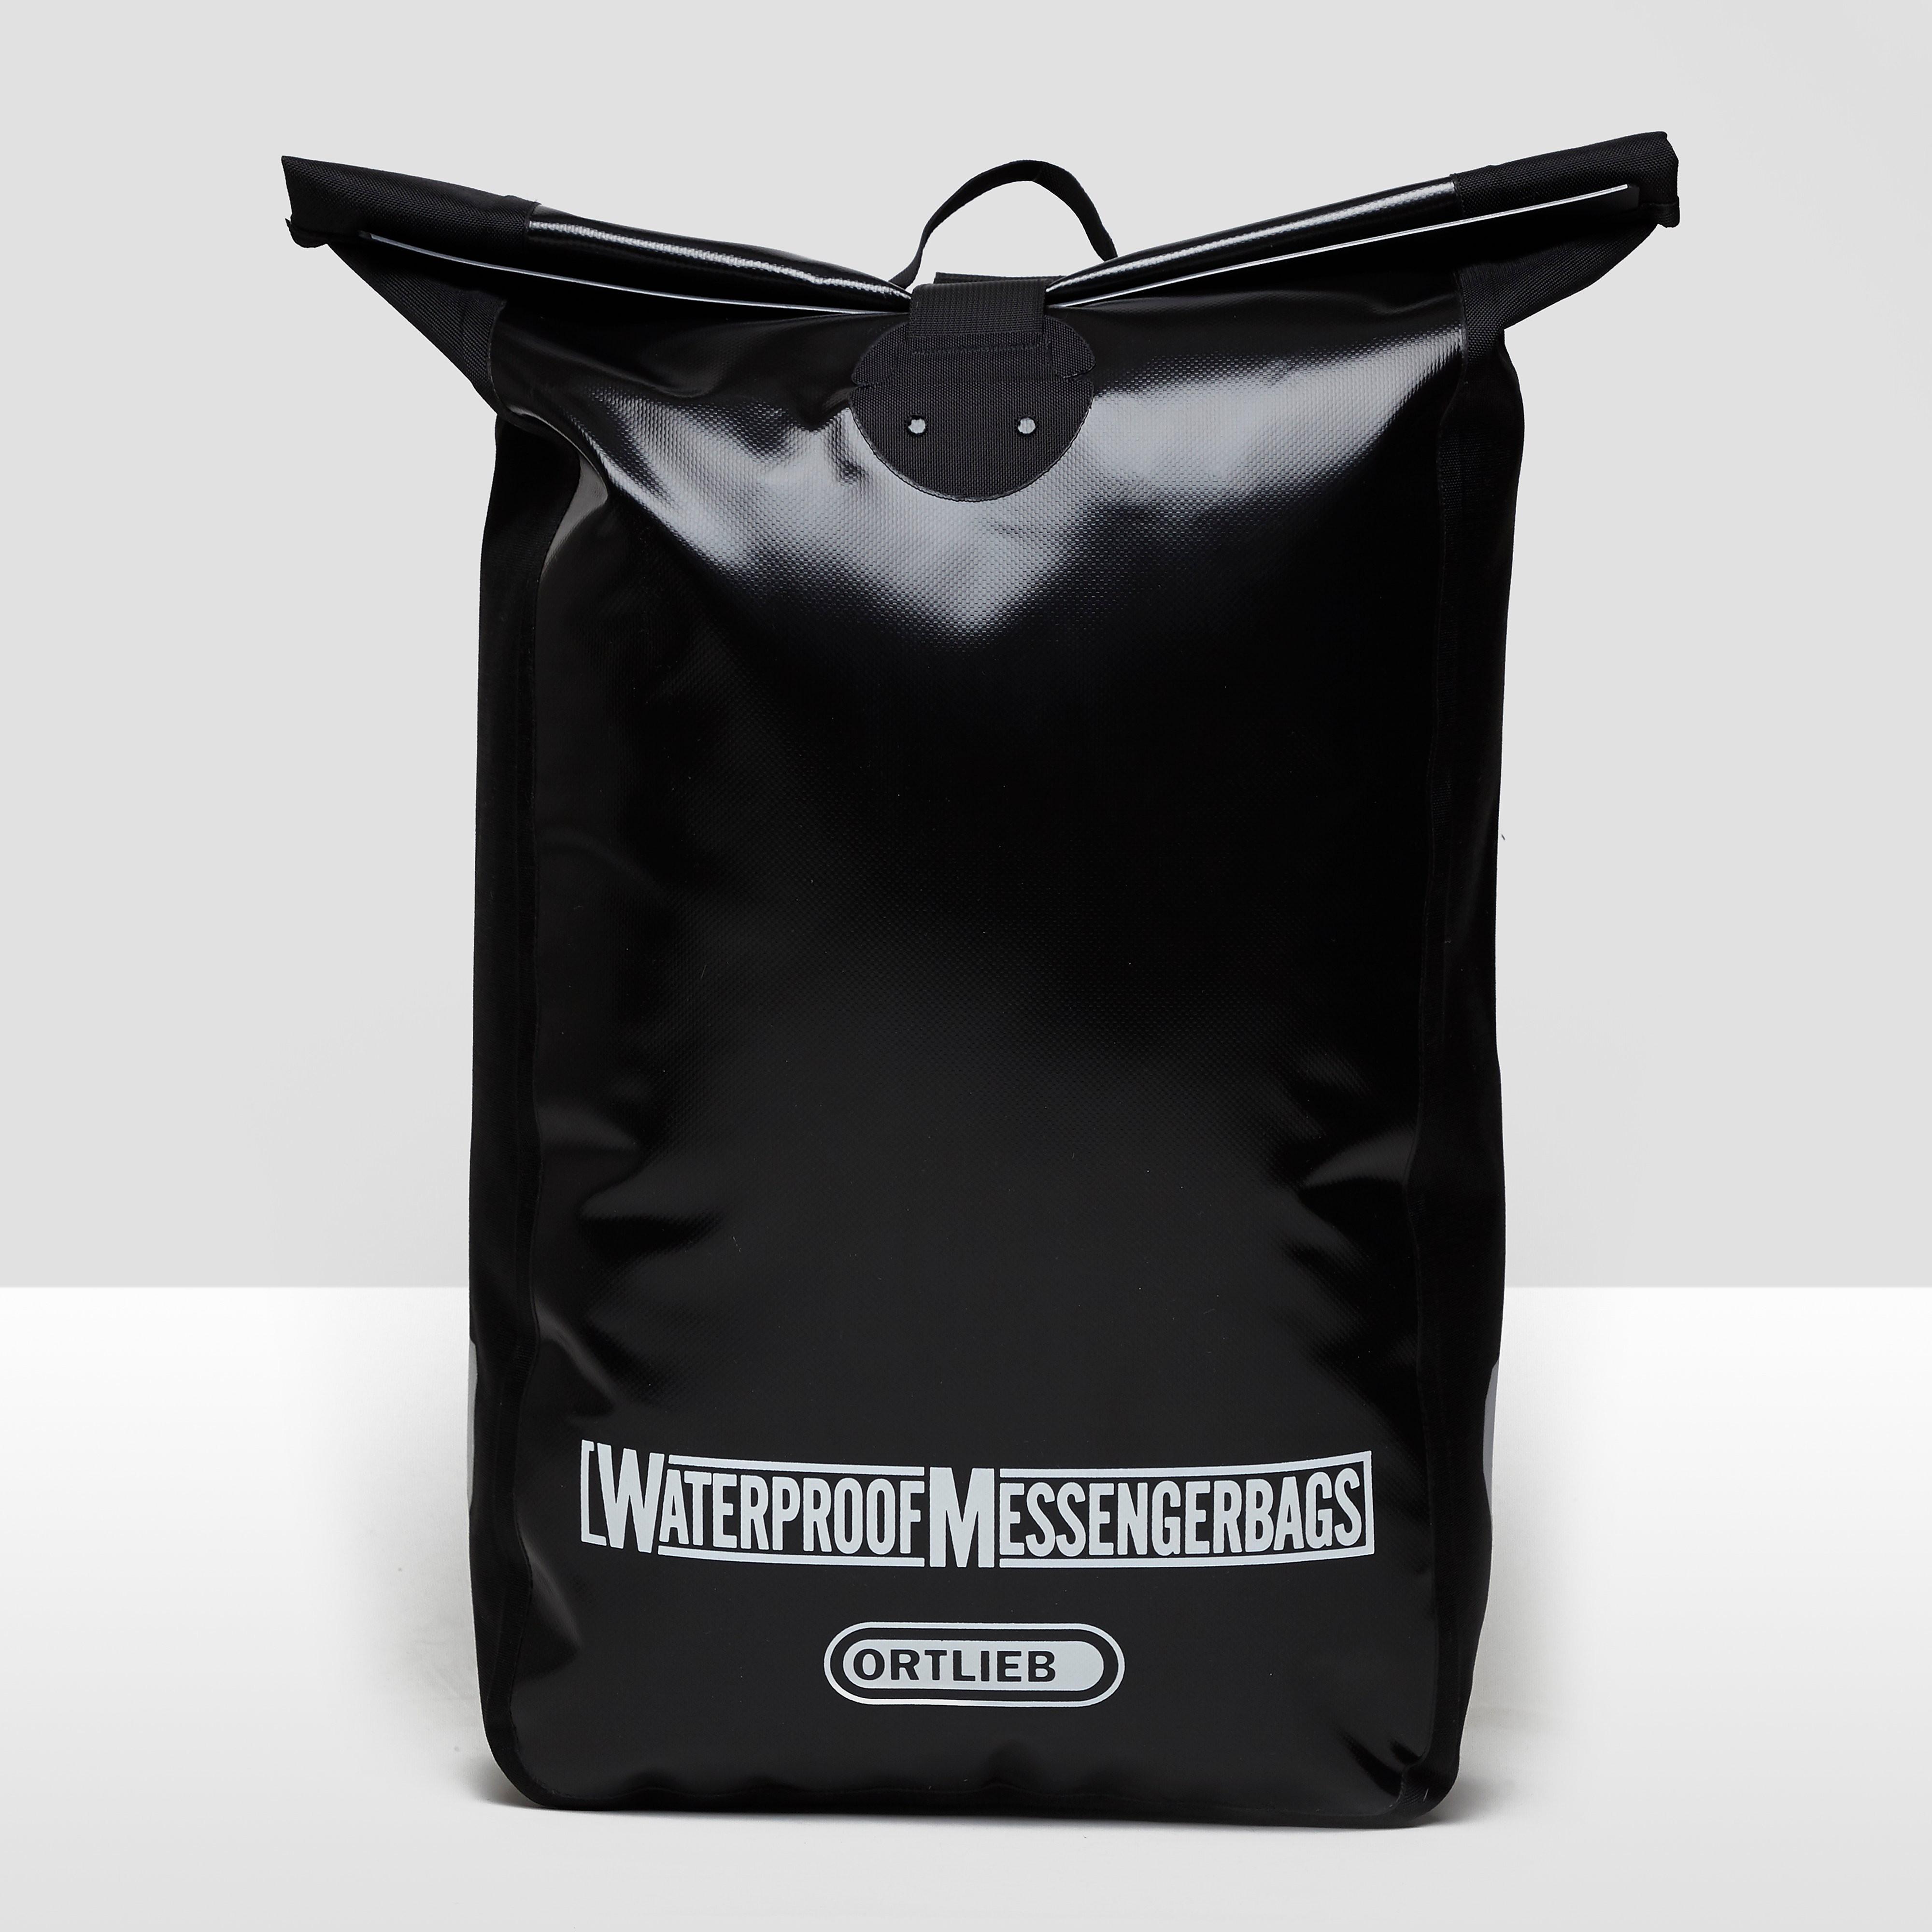 ORTLIEB MESSENGER BAG 39 LITER